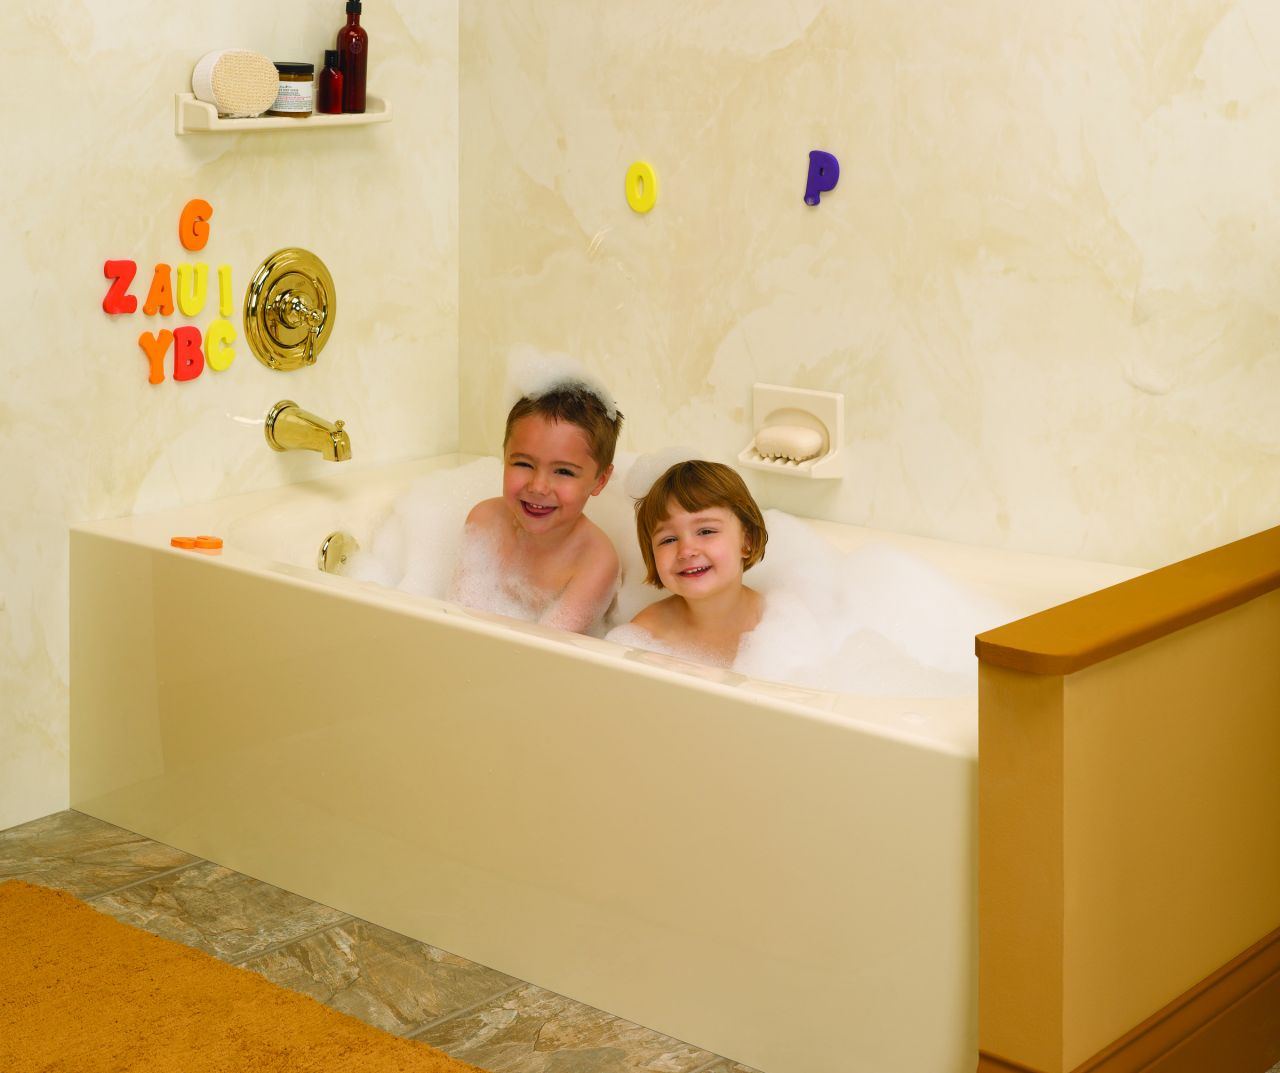 Unique Bathtub Kids Adornment - Bathroom and Shower Ideas - purosion.com